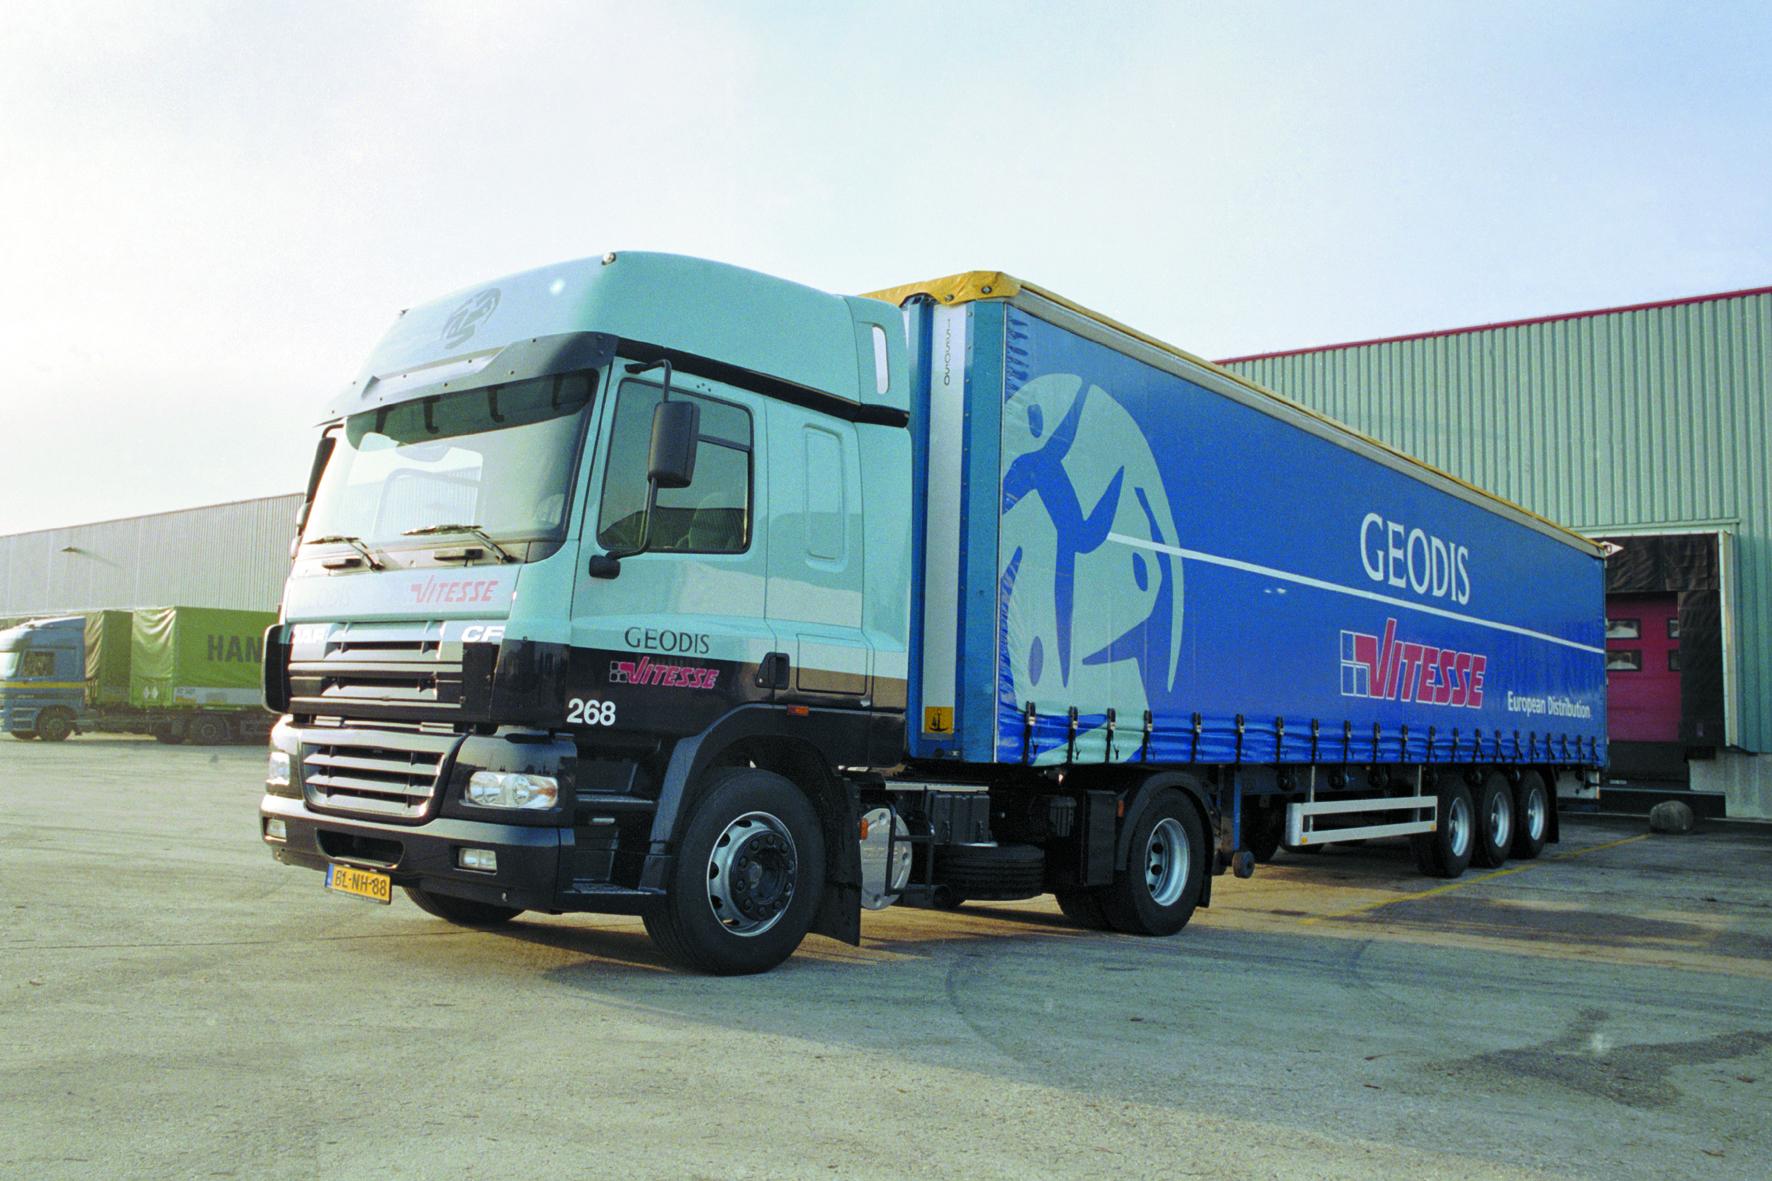 Geodis To Buy Logistics Operator Ohl ǀ Air Cargo News